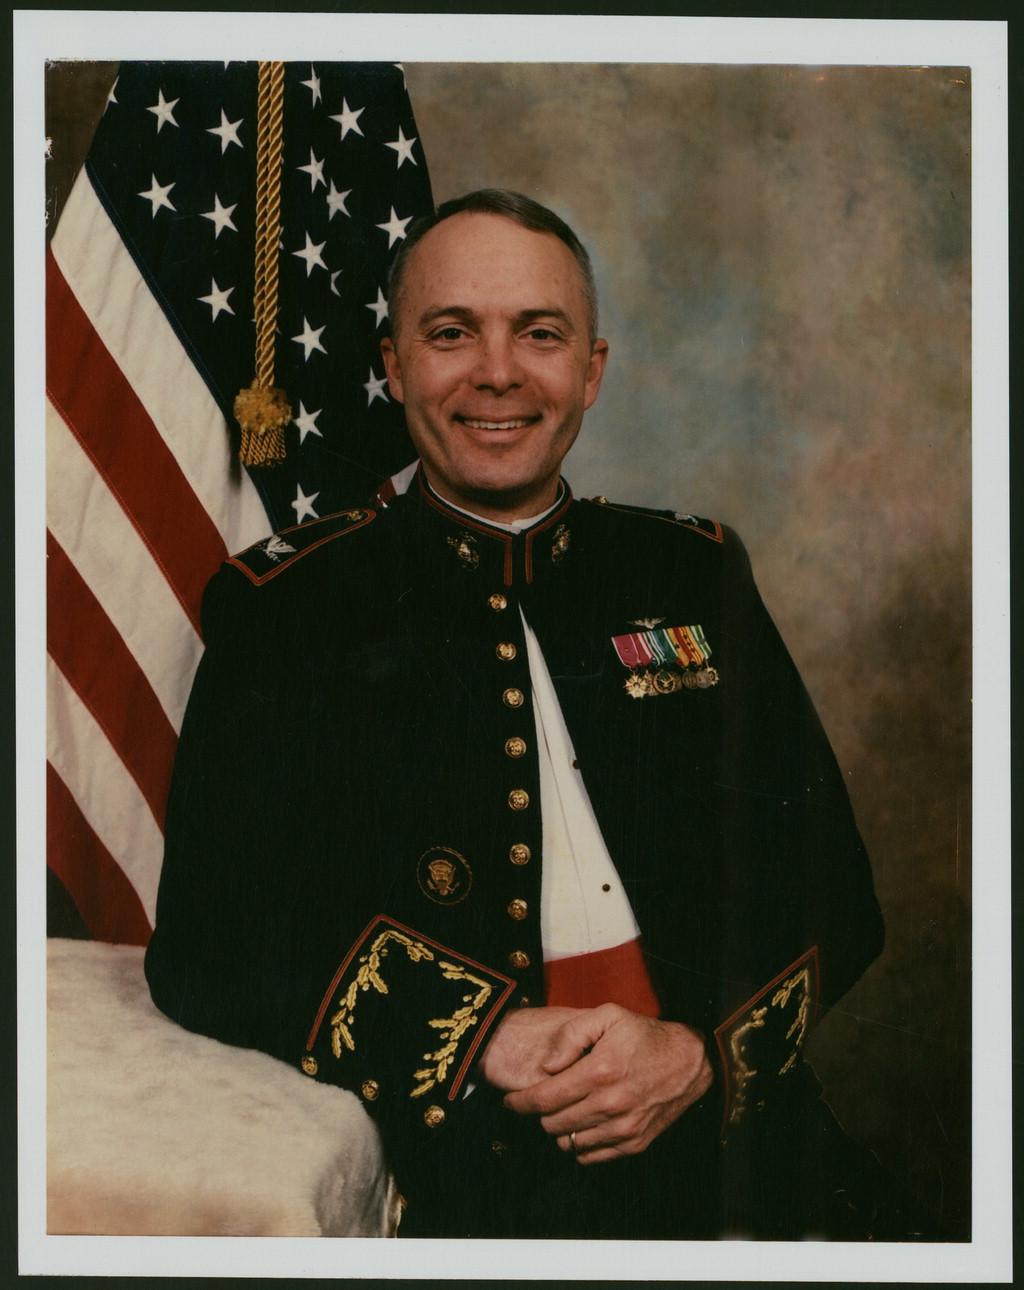 Rep. John Kline (R-Minn.). Photo courtesy Library of Congress.